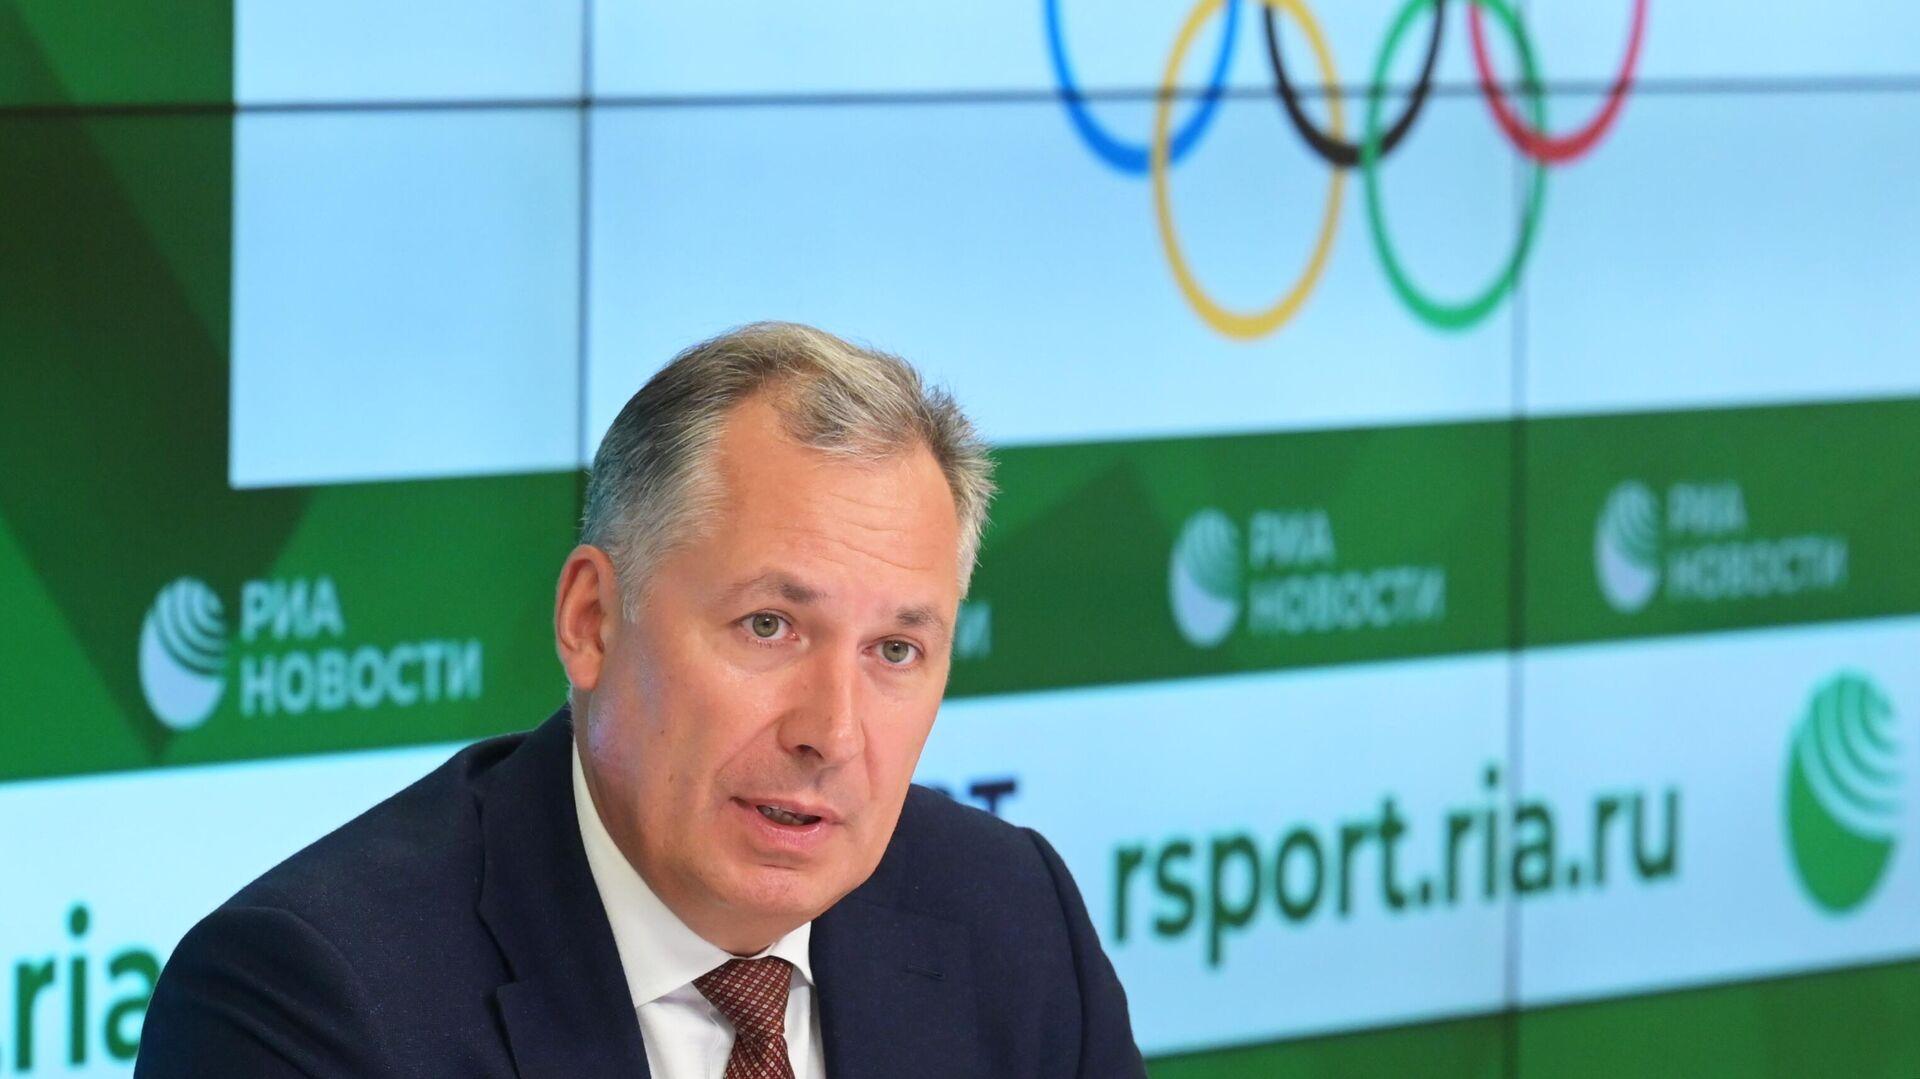 Президент Олимпийского комитета России (ОКР) Станислав Поздняков - Sputnik Беларусь, 1920, 23.09.2021